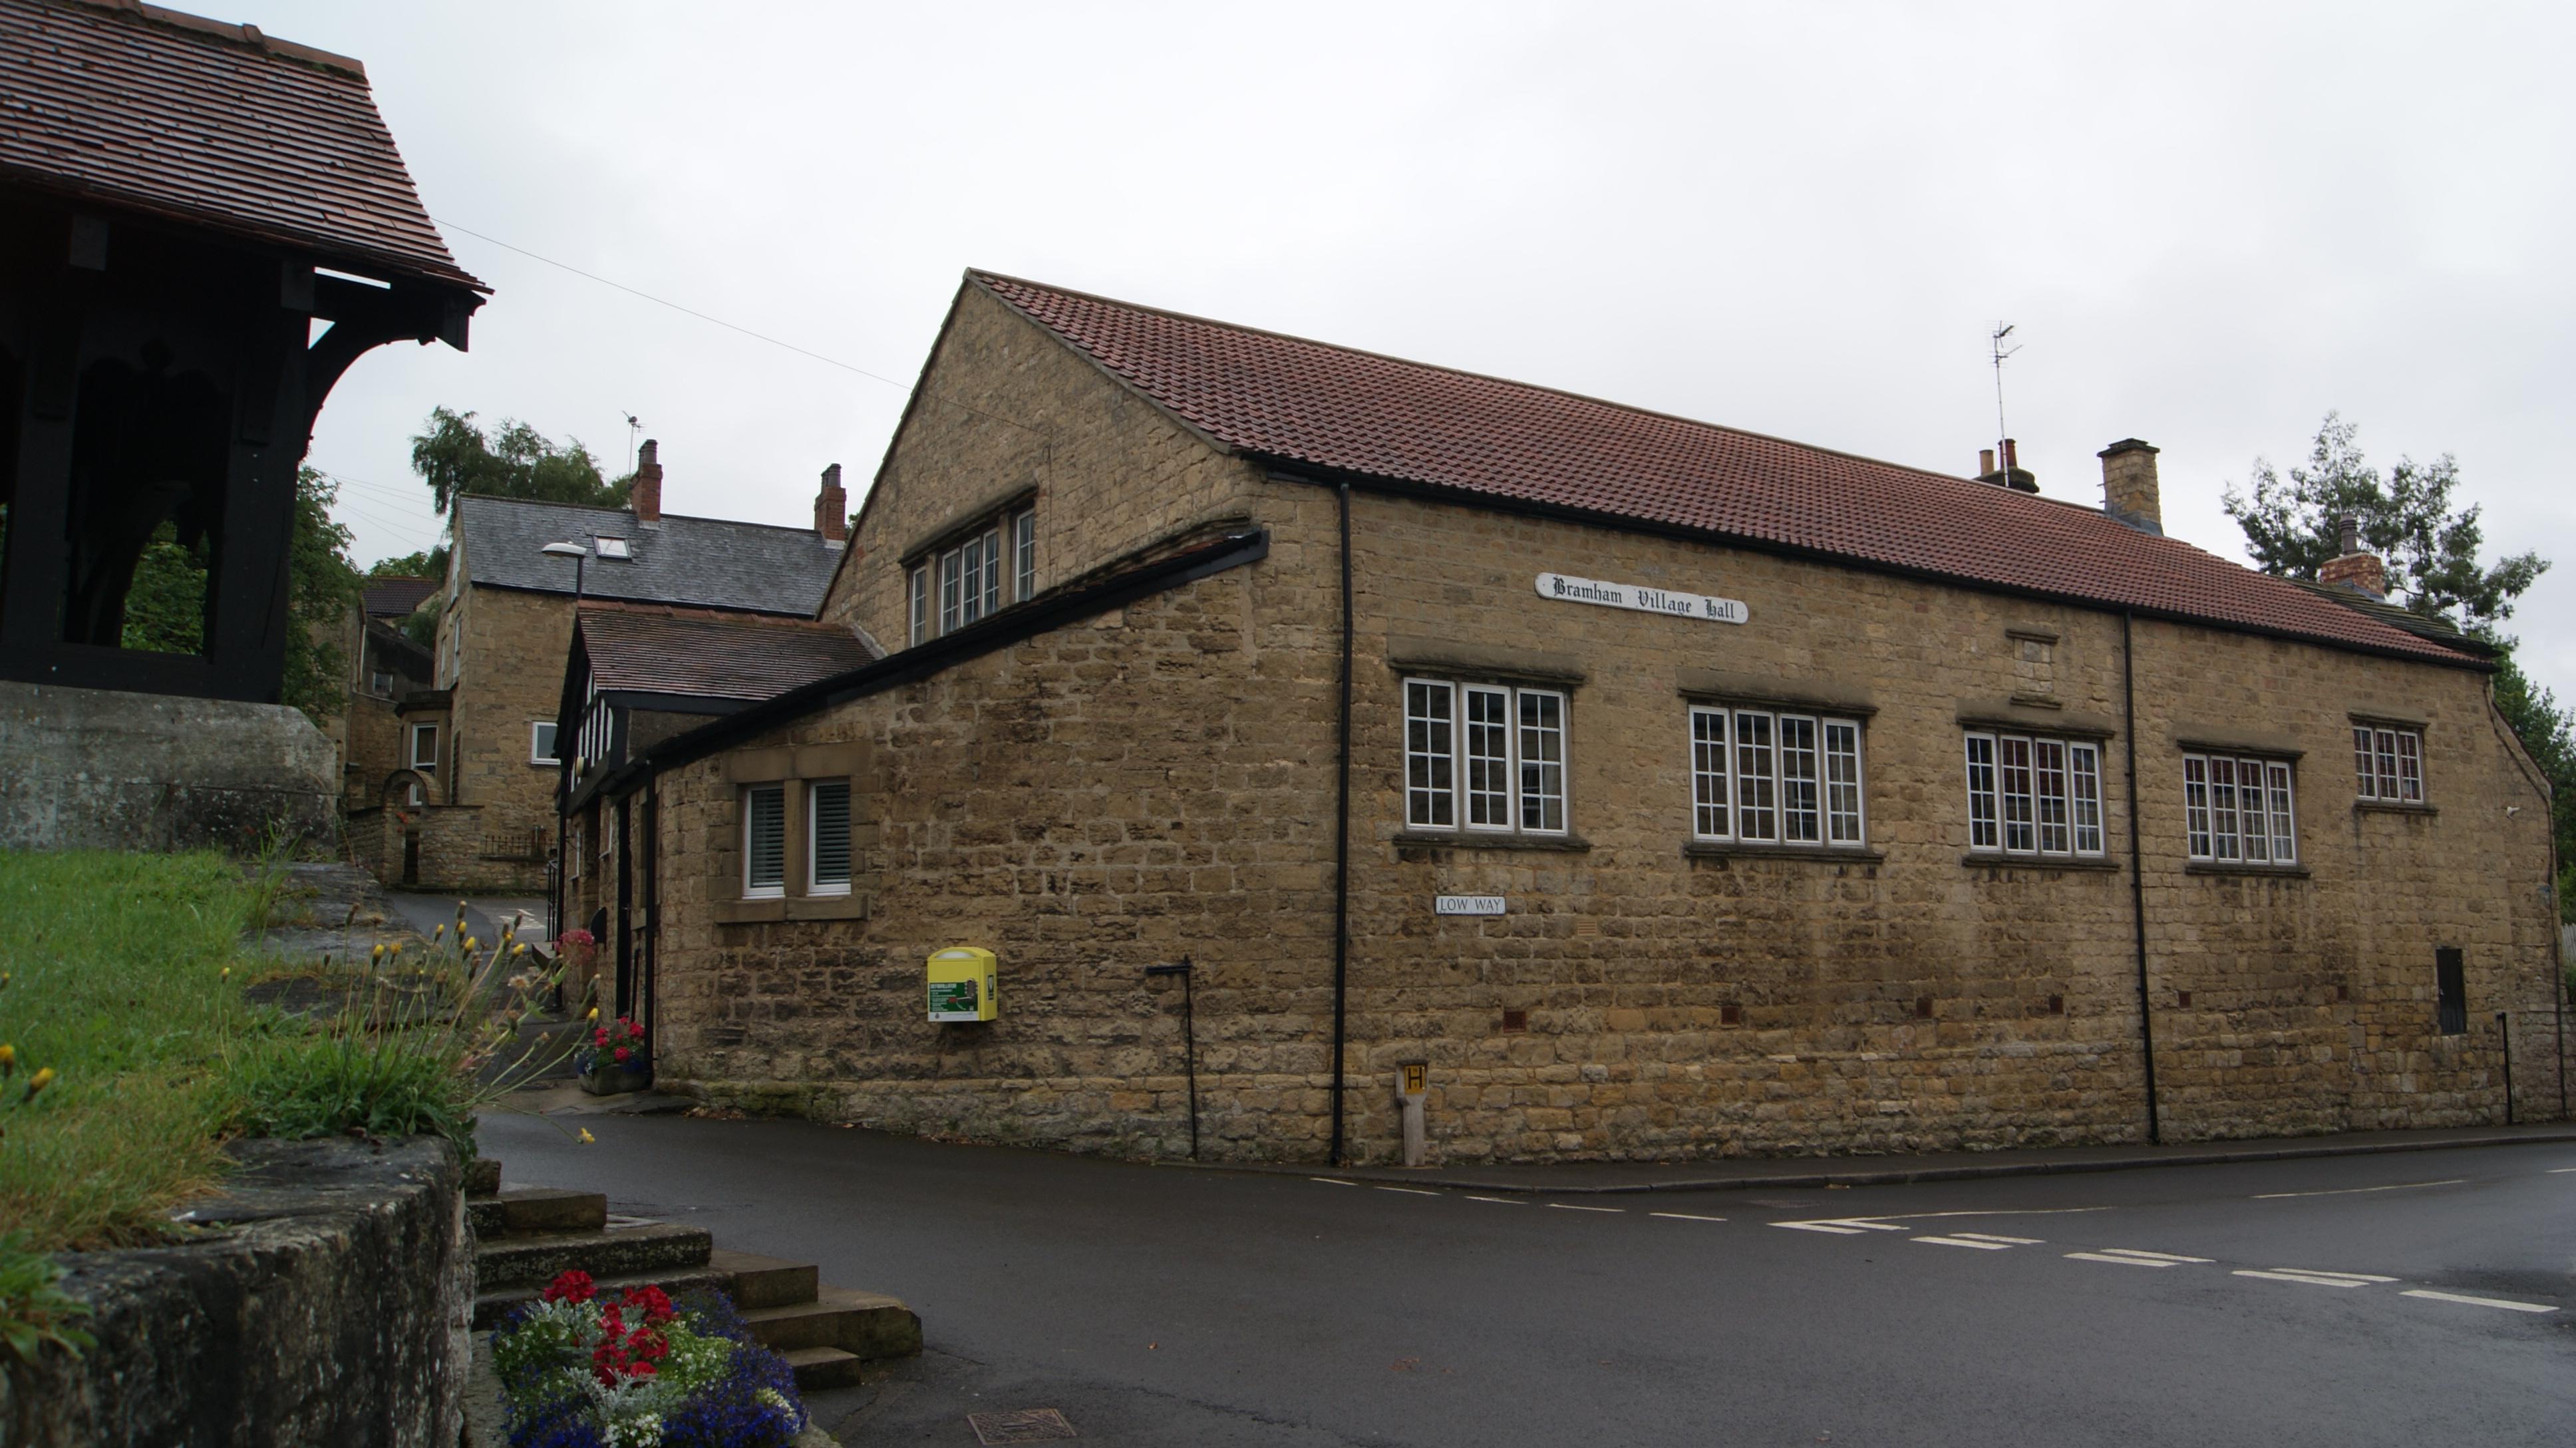 File:Village Hall, Bramham, West Yorkshire (11th July 2017) 001